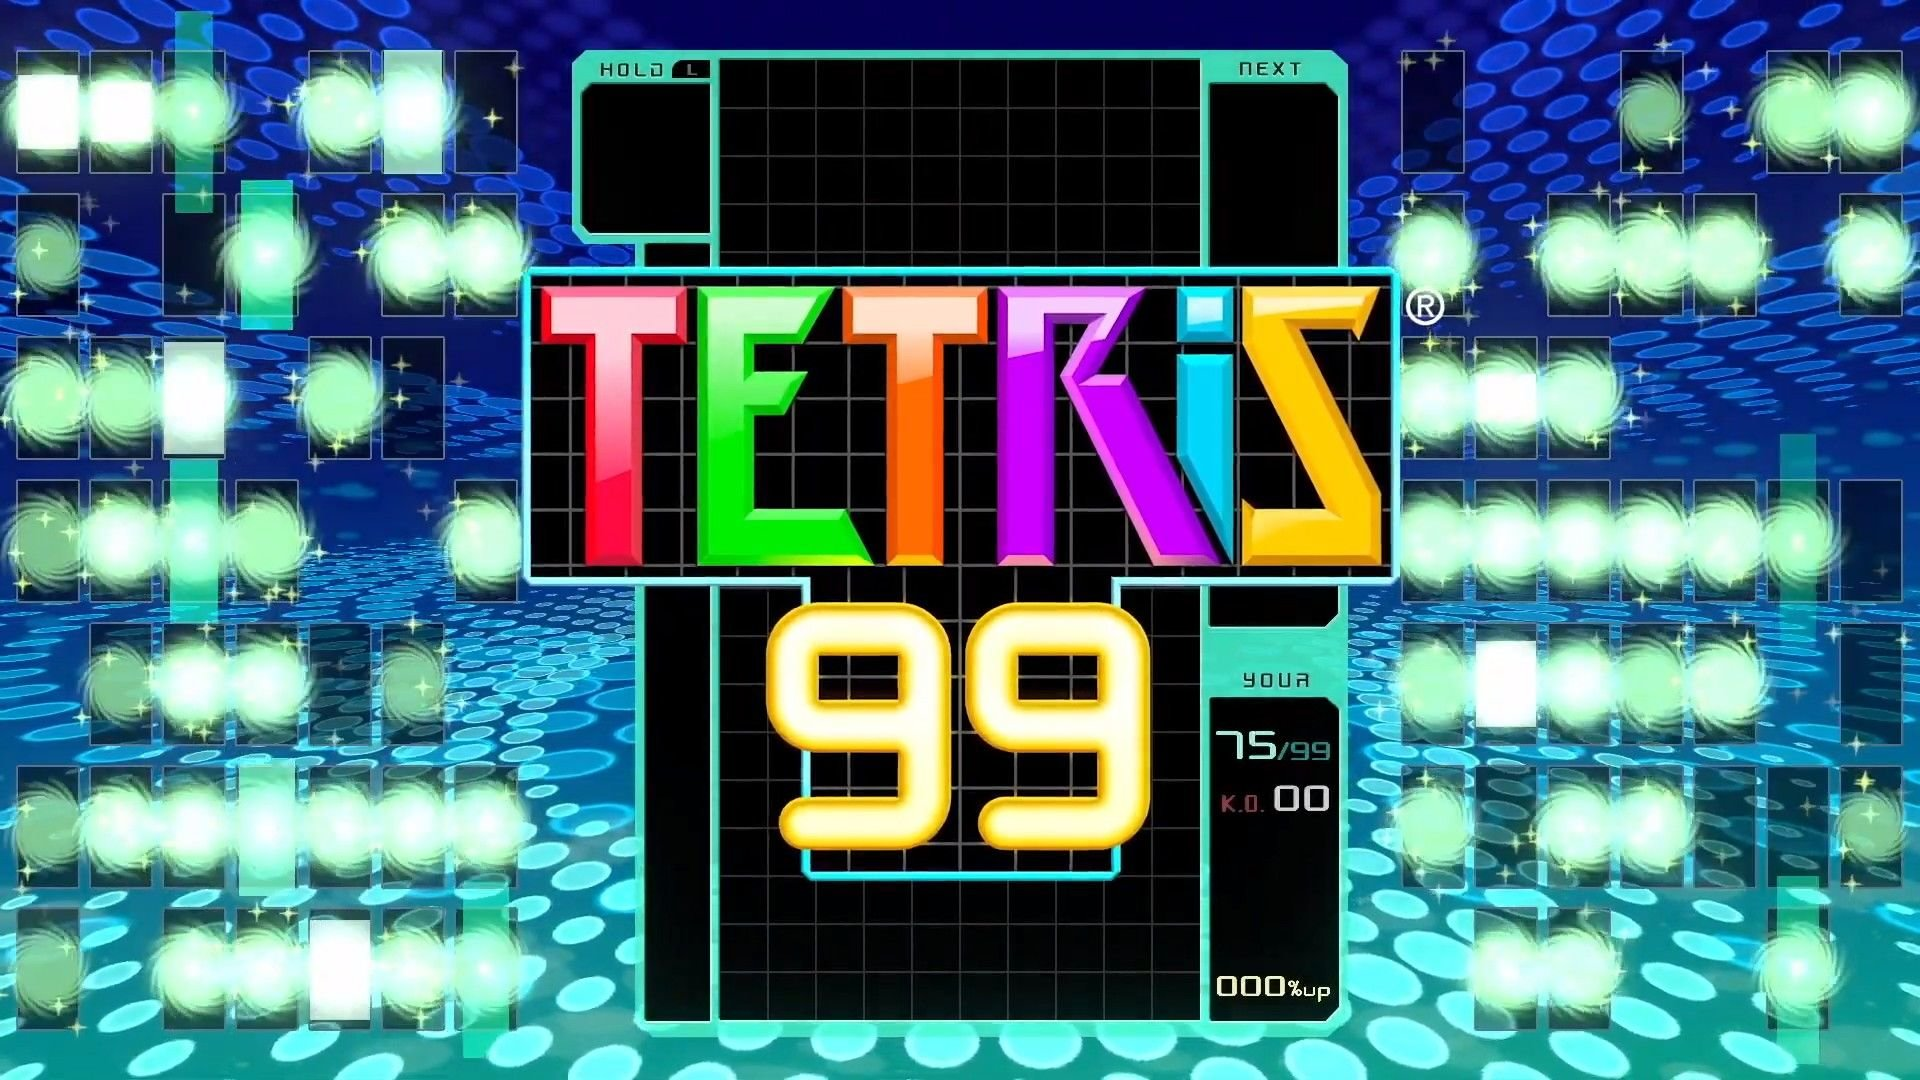 Tetris 99 'Big Block' DLC Includes Offline Play, 3rd Maximus